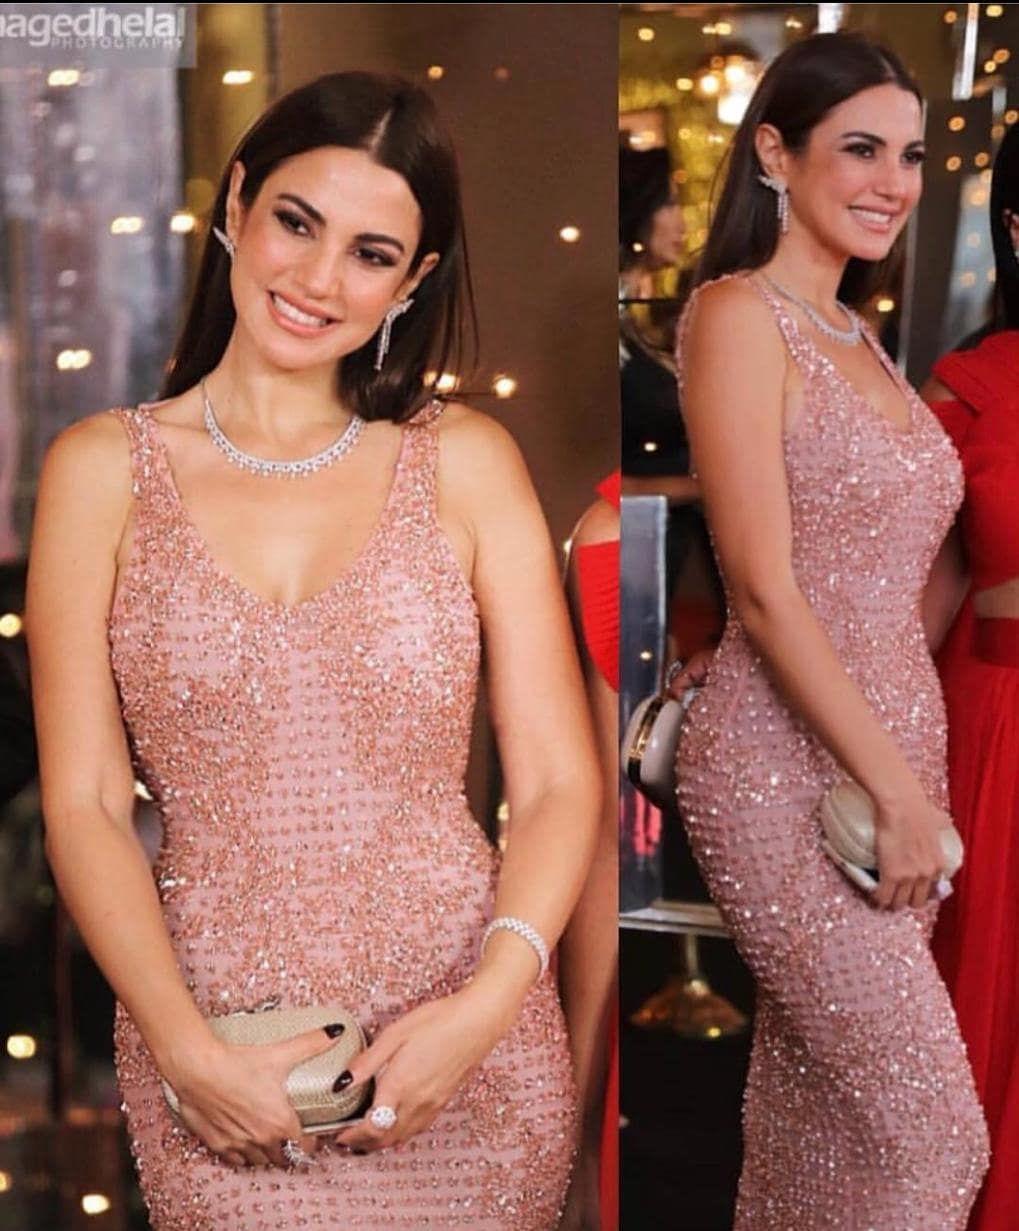 Egypt Celebrity On Instagram عمرو دياب لما غنا يتعلموا يتعلموا م الرقة دي يتعلموا كان يقصد درة Dorra Zarro Dresses Formal Dresses Sleeveless Formal Dress